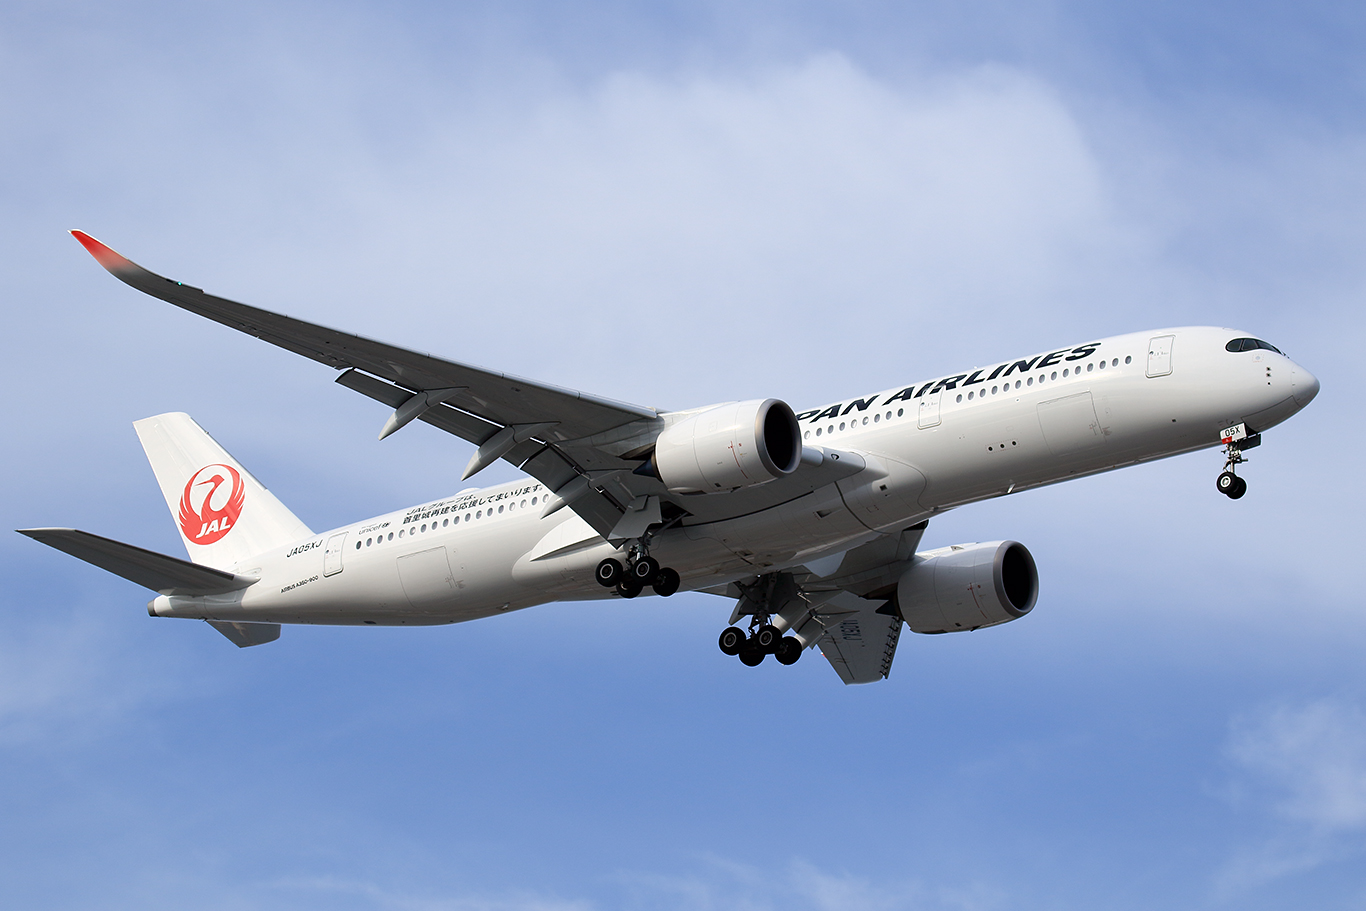 JL/JAL/日本航空 JL910 A350-900 JA05XJ